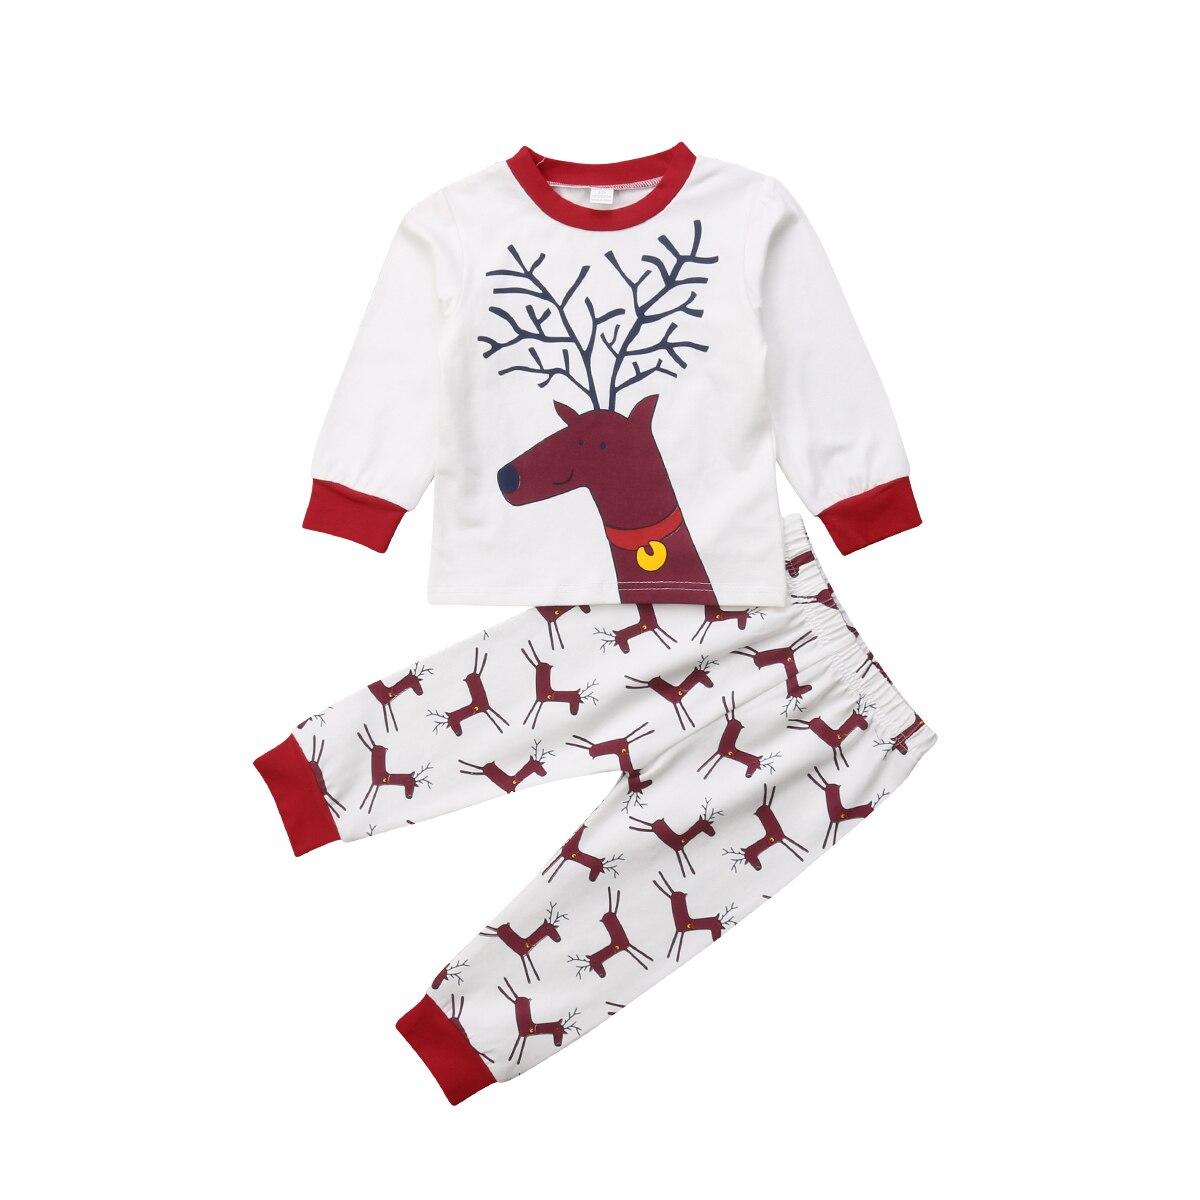 Toddler Baby Girl Boy Christmas Deer Pajamas Set Deer Tops Pants Home wear Pajamas Christmas Kids Clothes Sleepwear 2PCS Set deer print pocket front pajama set